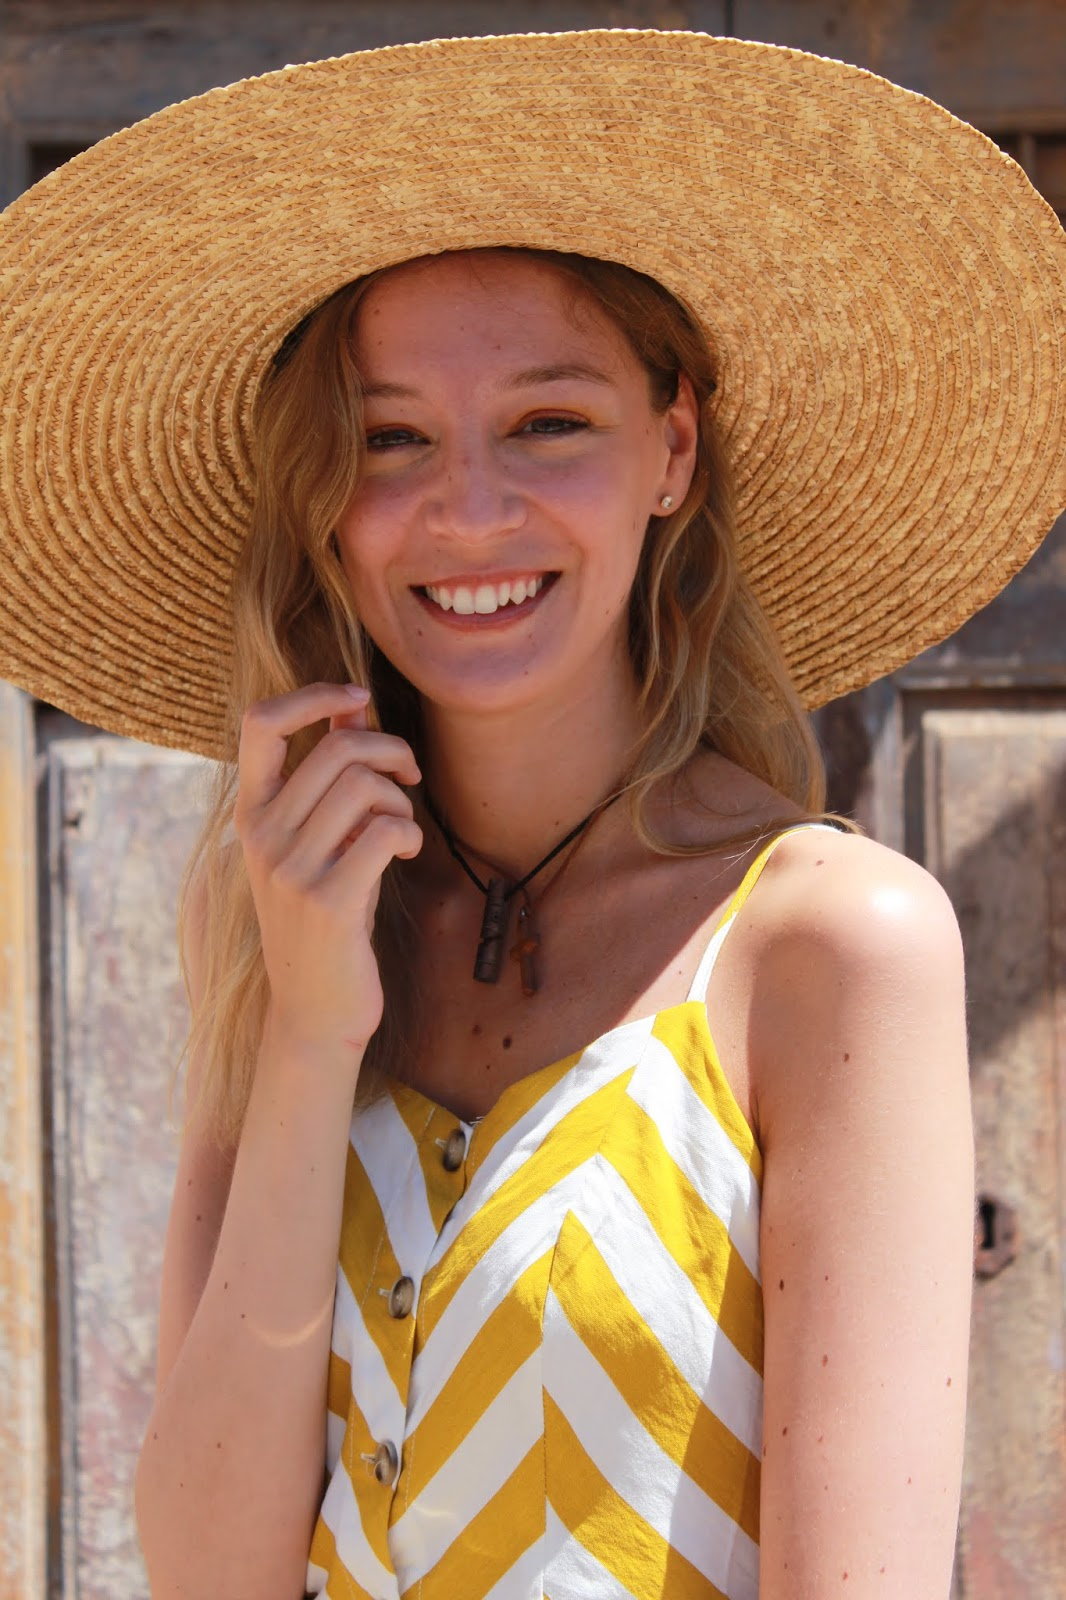 yellow-stripes-midi-dress-straw-hat-straw-bag-leather-espadrilles